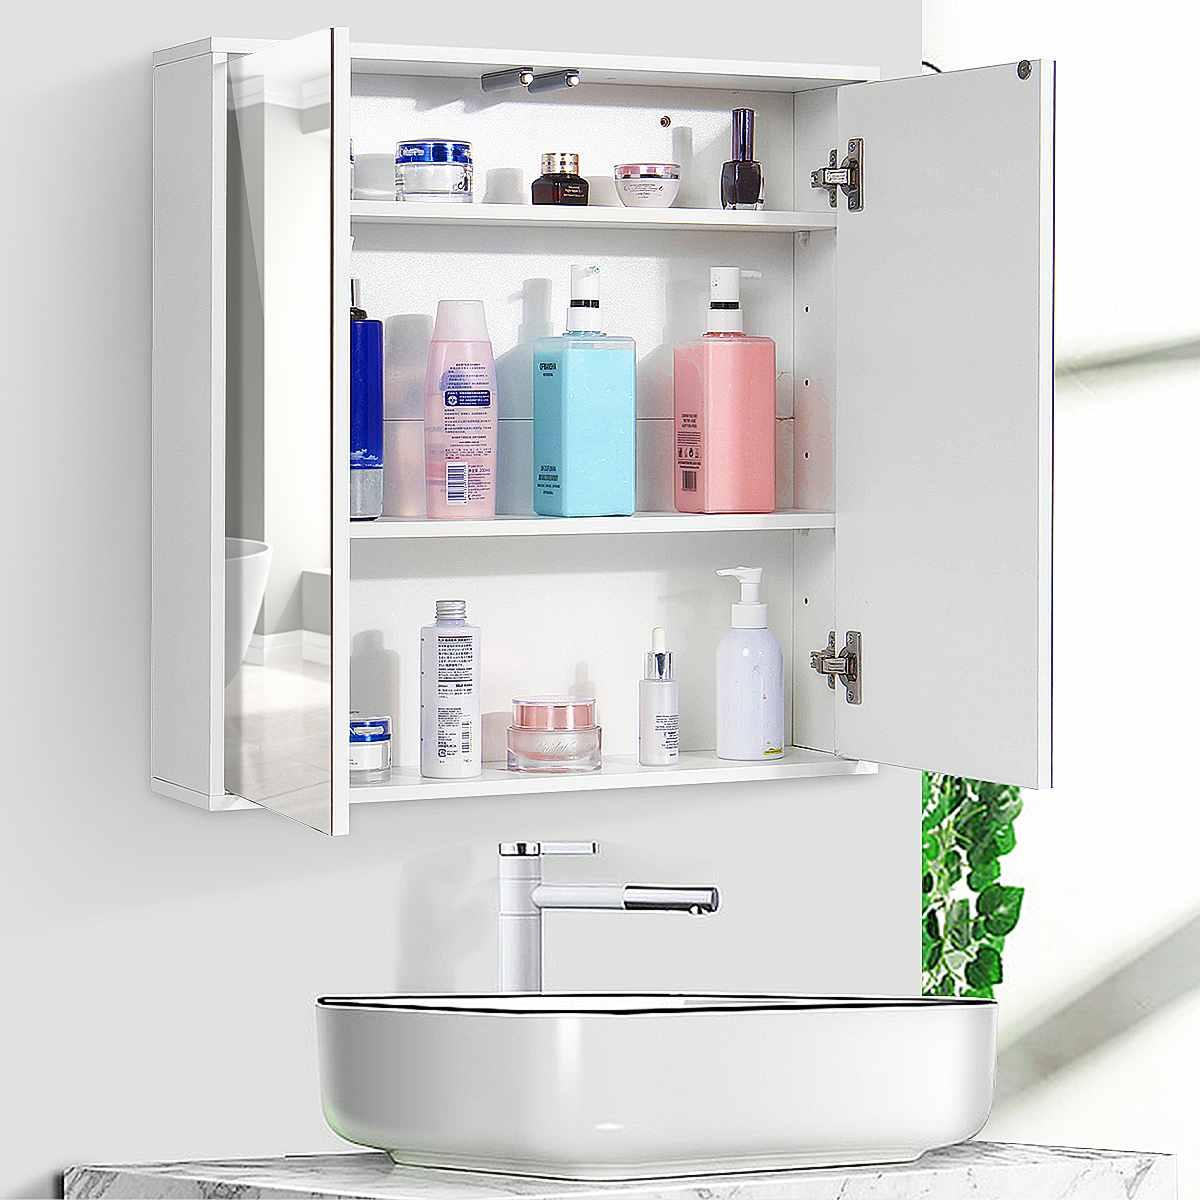 60x60x14.5cm Bathroom Cabinet Wall Mounted Bathroom Toilet Furniture Mirror Cabinet Cupboard Shelf Cosmetic Storager UK Stock